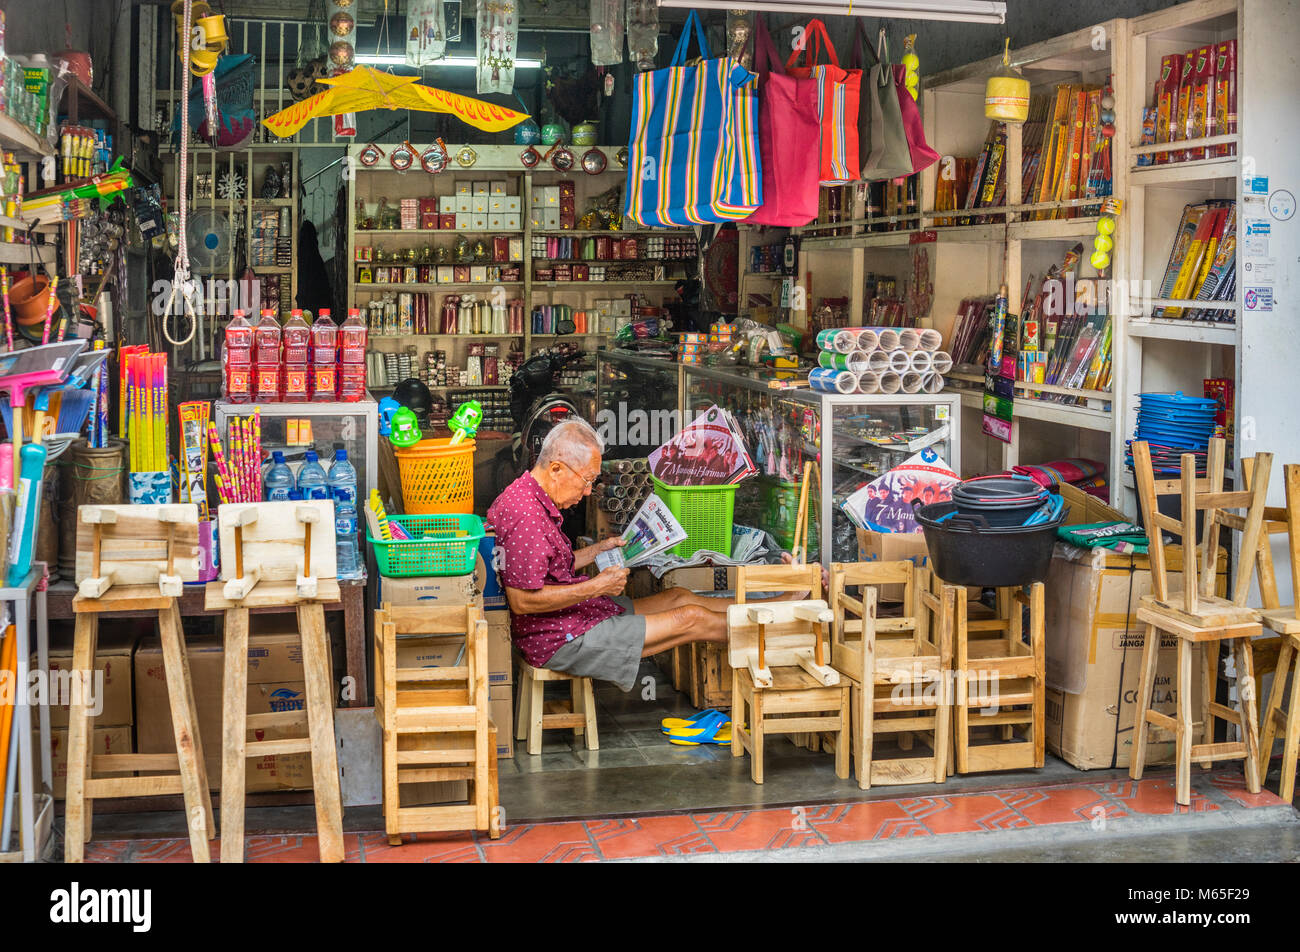 Indonesia, Central Java, Yogyakarta, Malioboro, shop keeper at Jalan Pajeksan - Stock Image